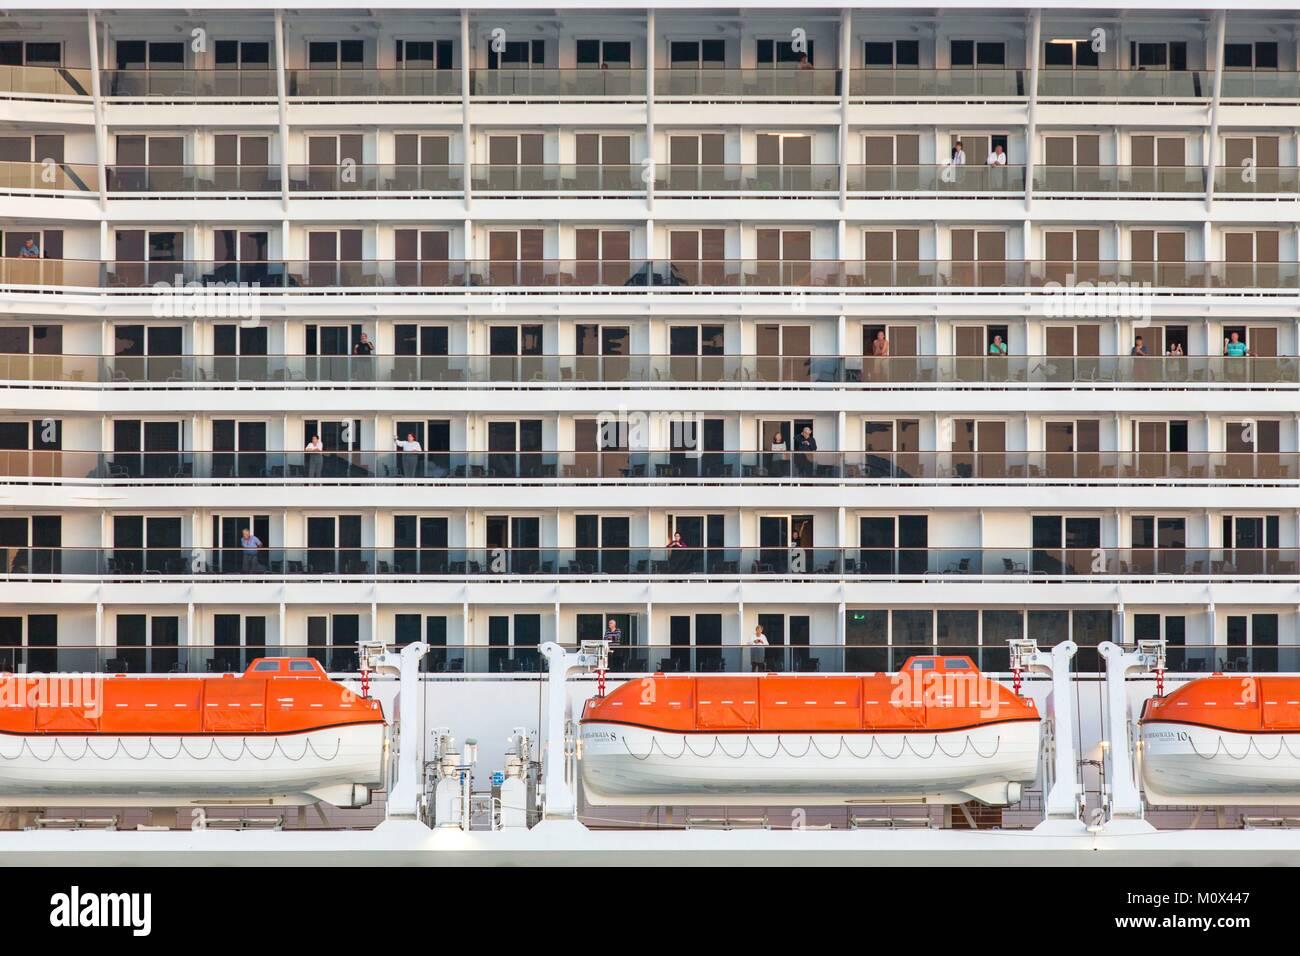 Malta,Valletta,cabins of an MSC cruise liner - Stock Image